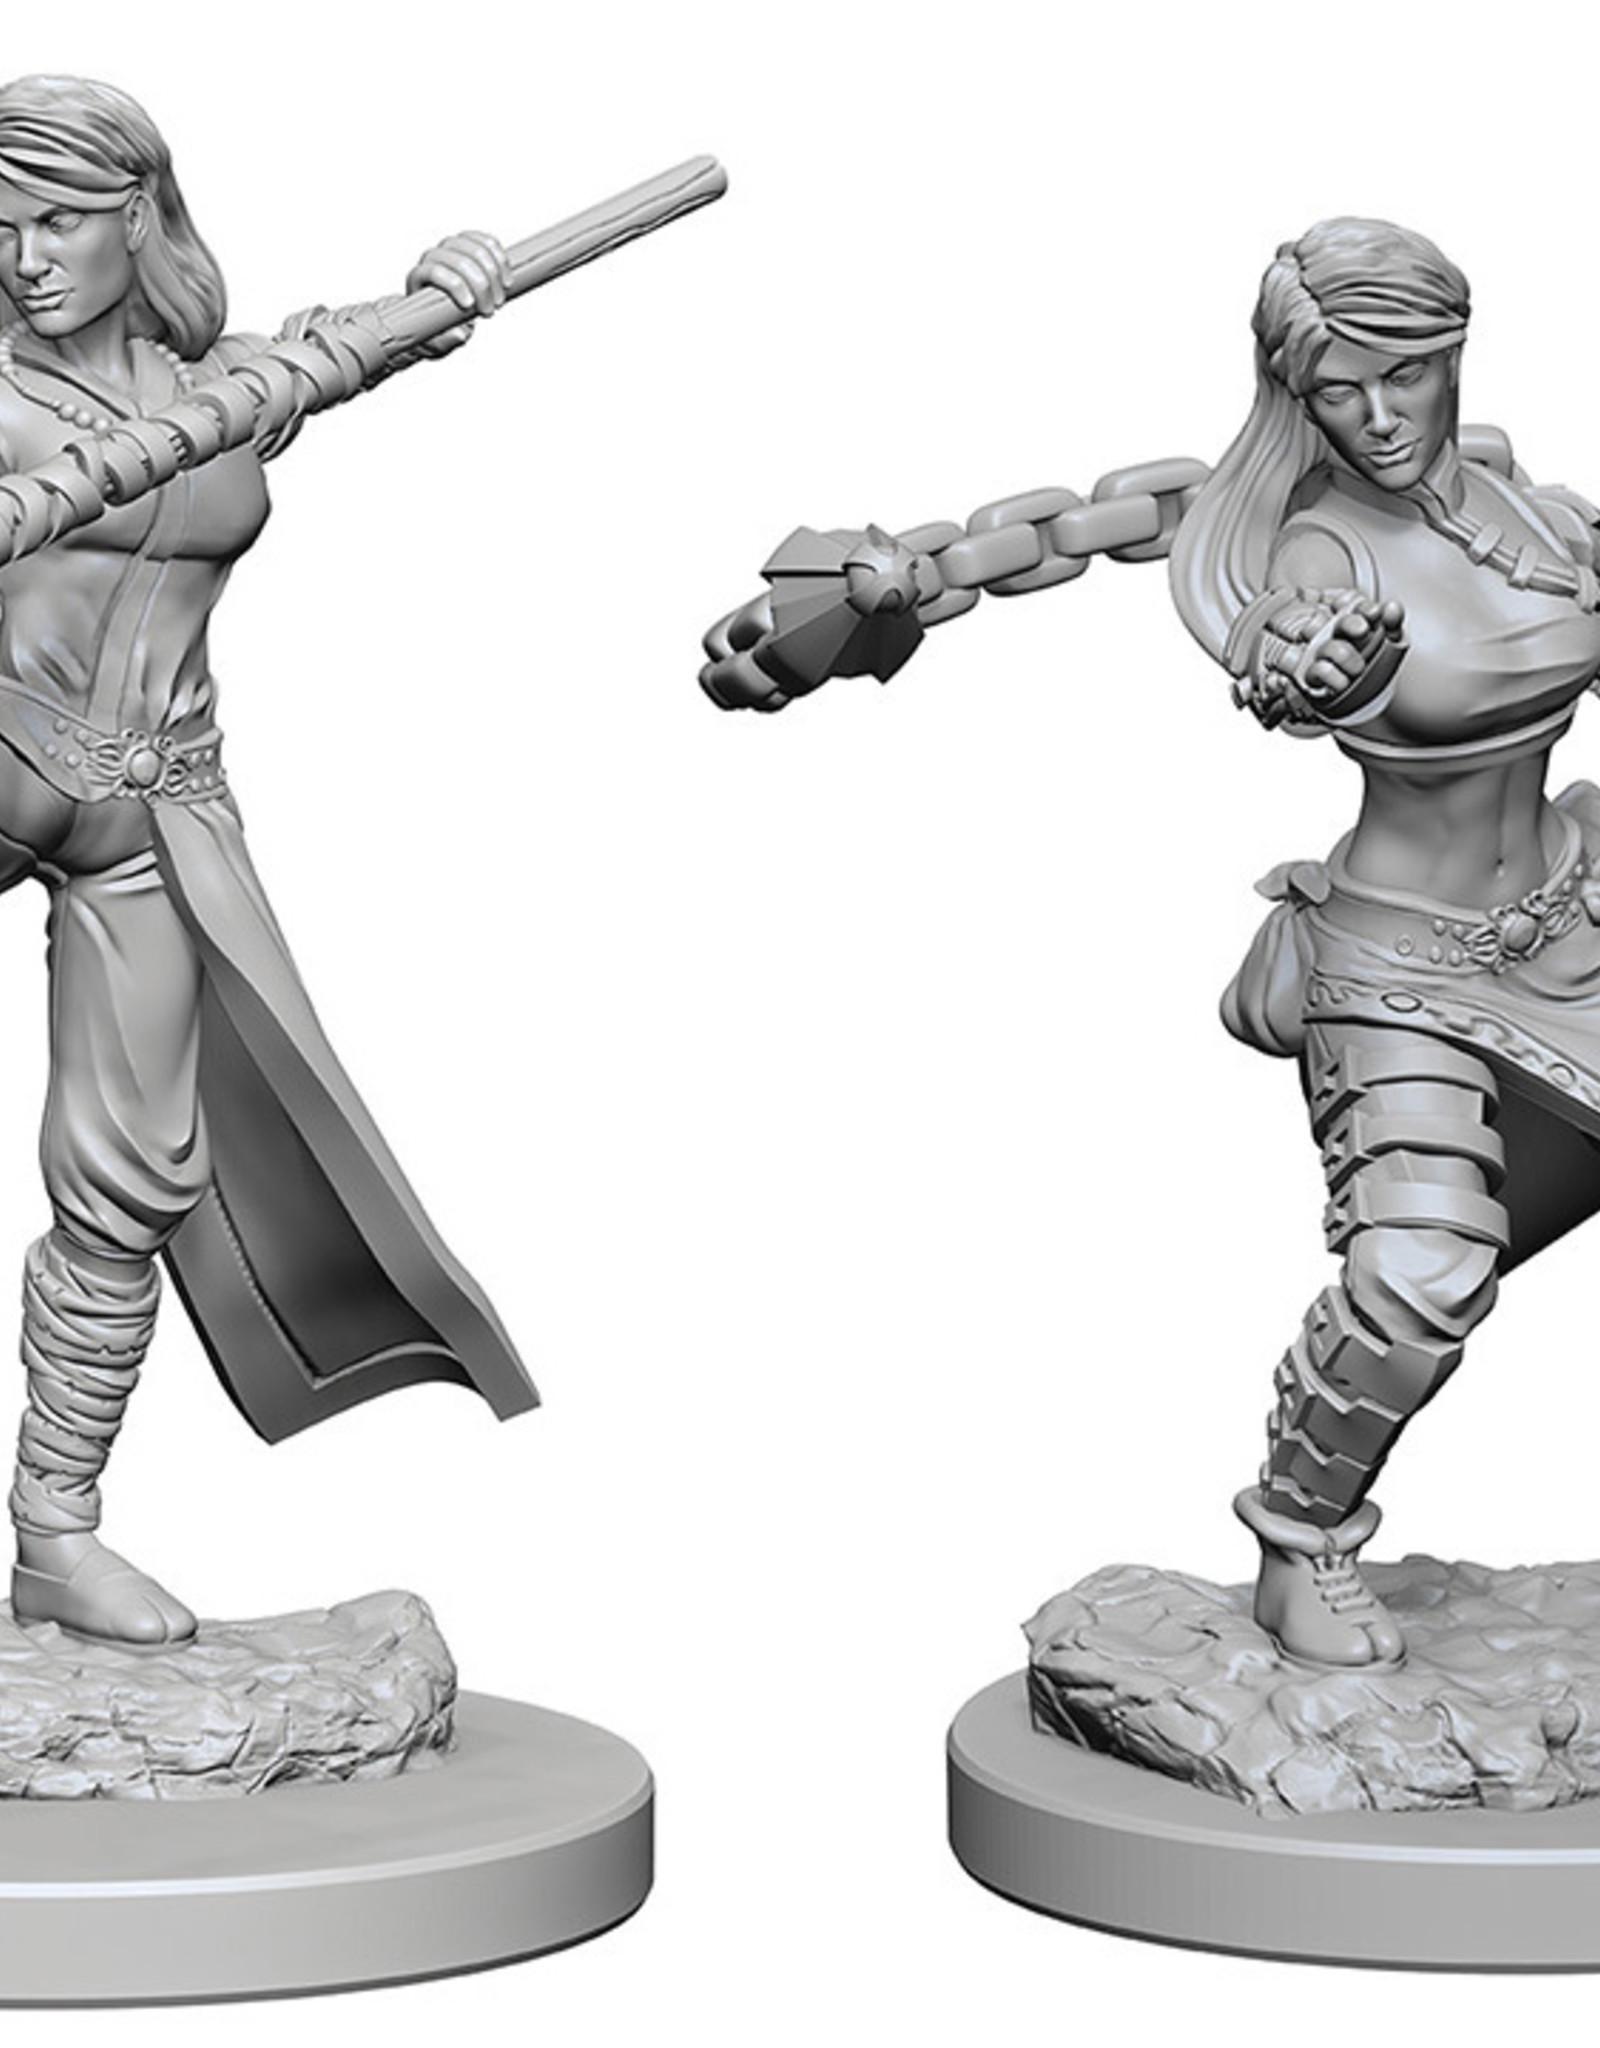 Dungeons & Dragons Nolzur`s W1 Human Female Monk